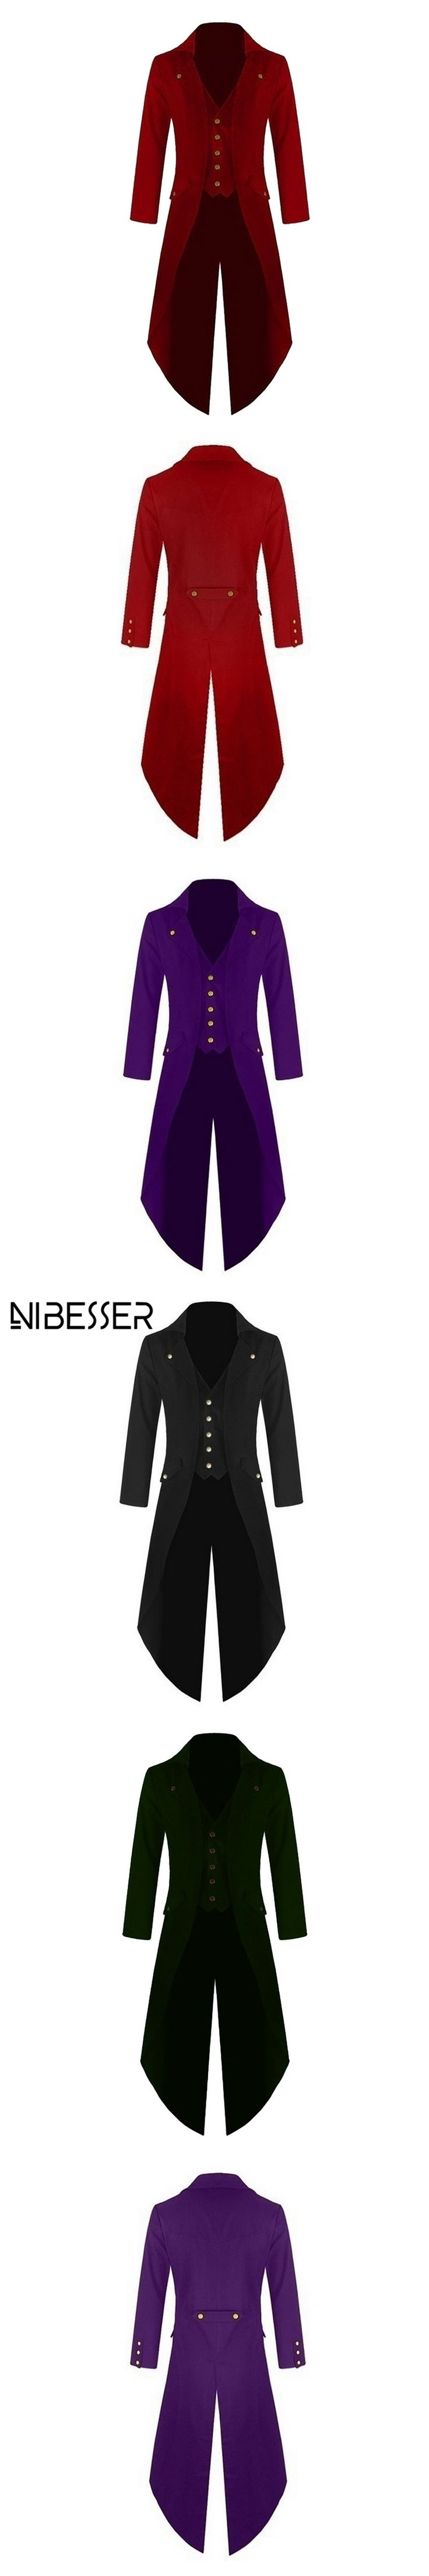 NIBESSER 2017 High Quality Long Blazer Jackets Men Punk Retro Tuxedo Wedding Jacket Coat Women Autumn Solid Club Windbreaker Z30